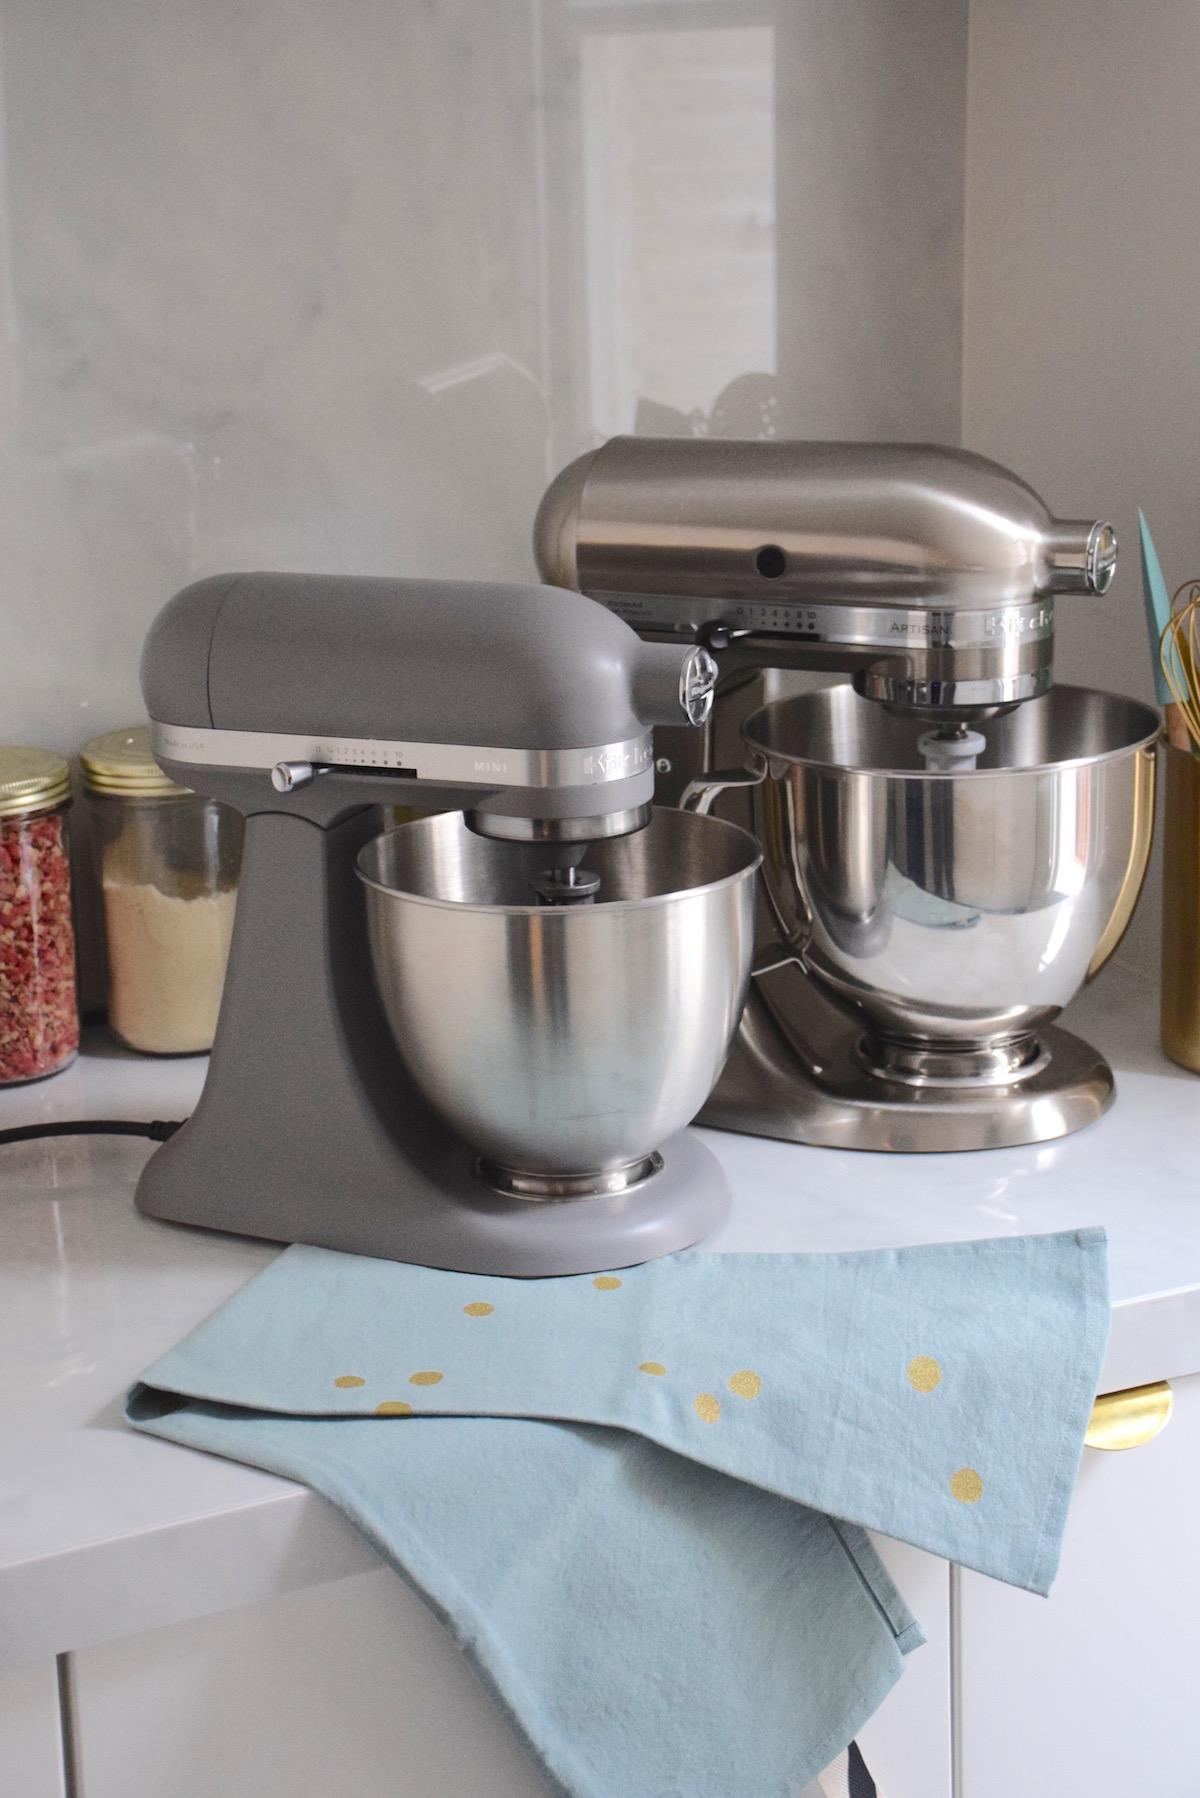 mini ou artisan quel robot p tissier kitchenaid choisir. Black Bedroom Furniture Sets. Home Design Ideas